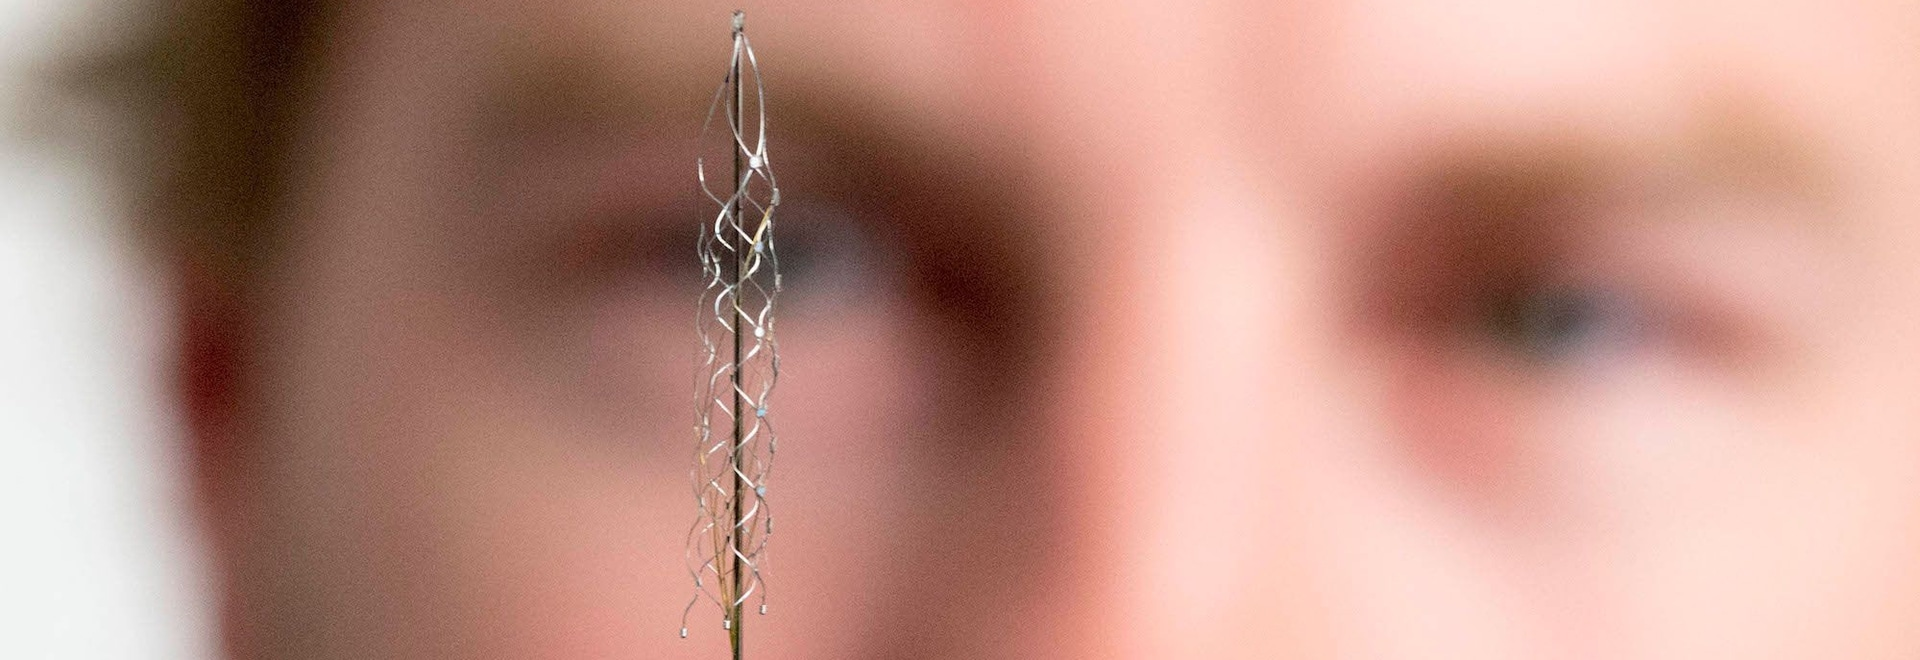 La interfaz cerebro-computadora mínimamente invasiva de Stentrode se pone a prueba